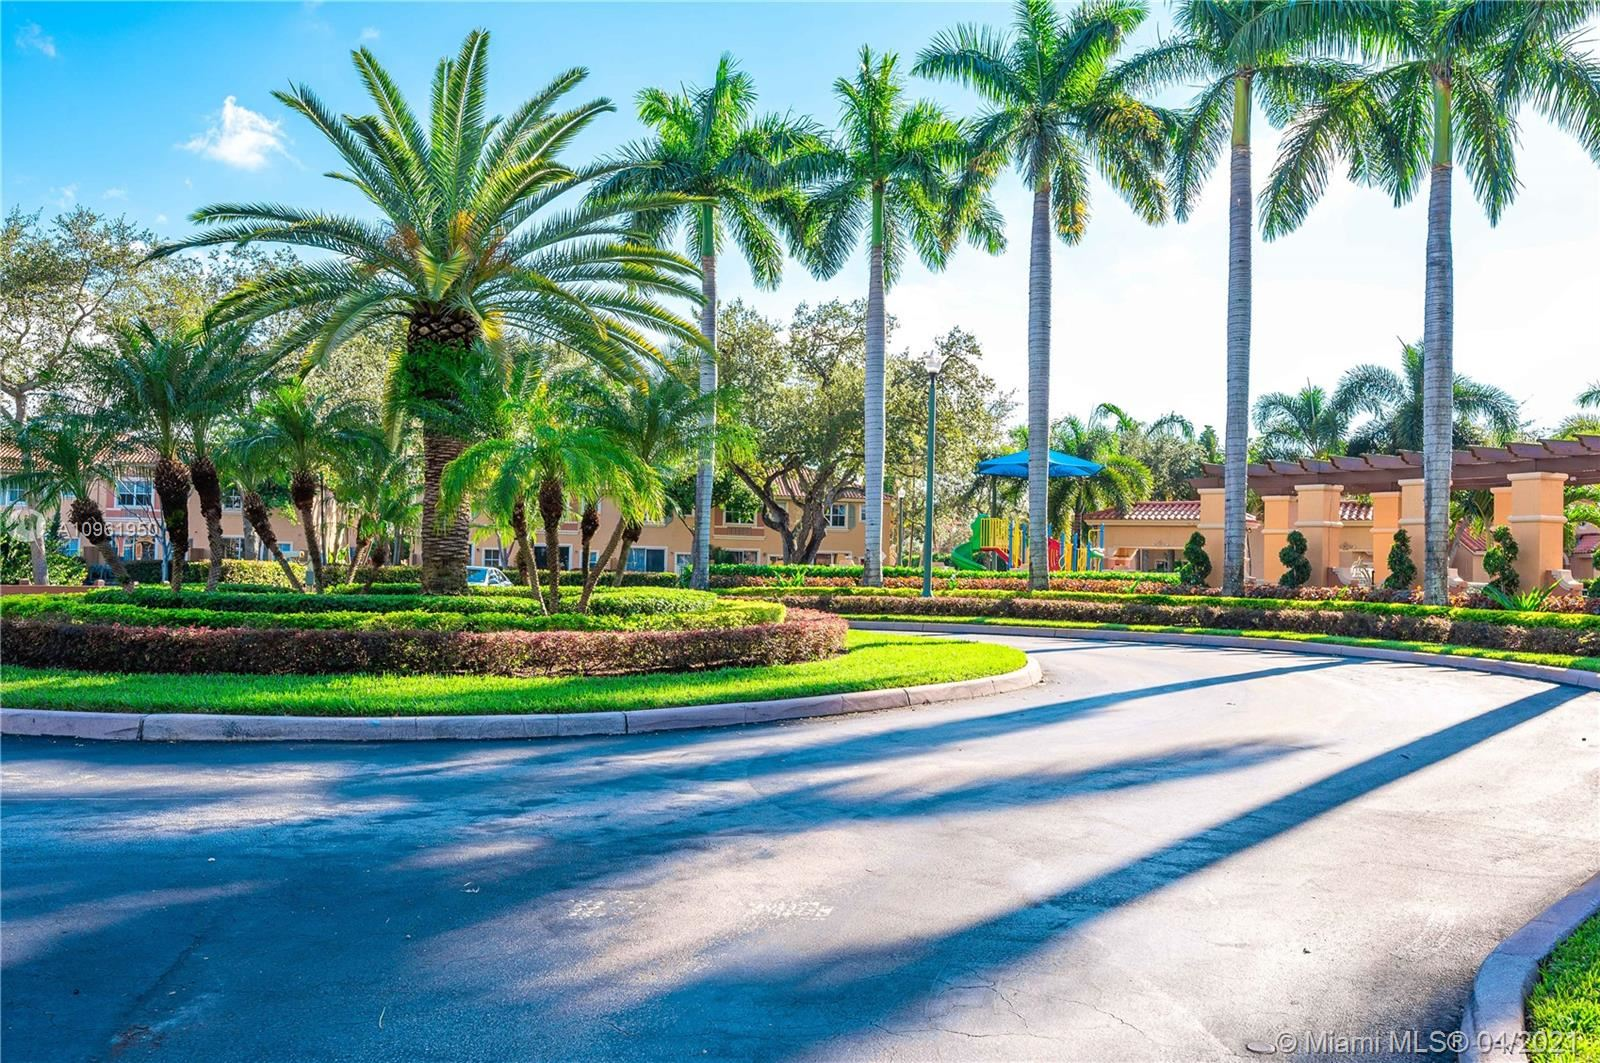 Photo of 4905 Schooner Dr, Dania Beach, FL 33312 (MLS # A10961950)